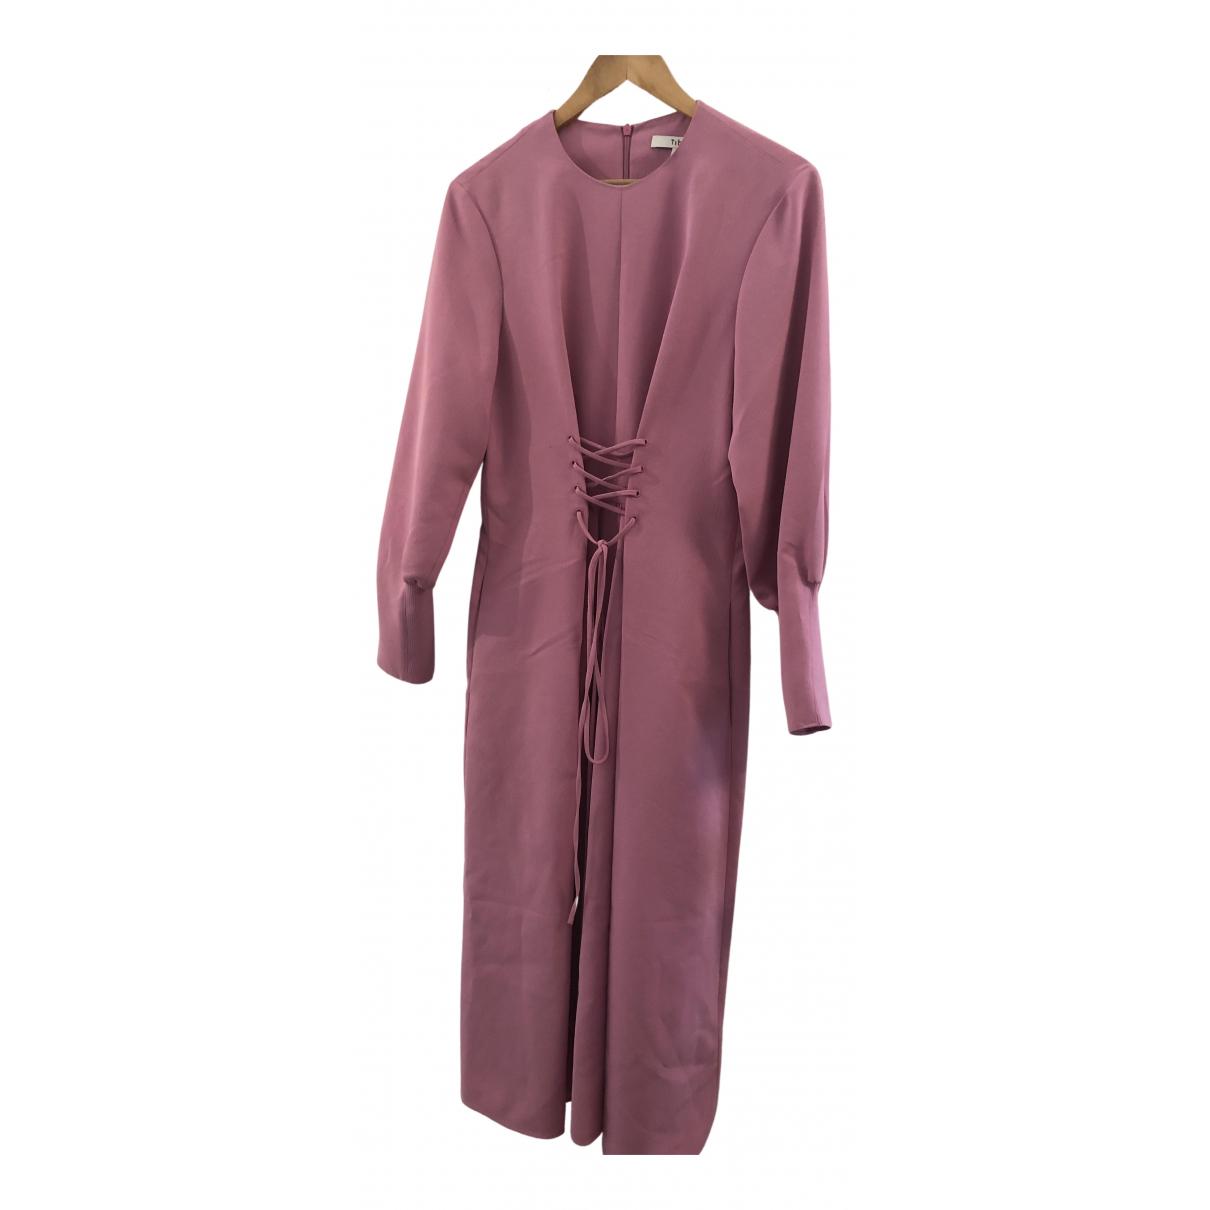 Tibi - Robe   pour femme - rose